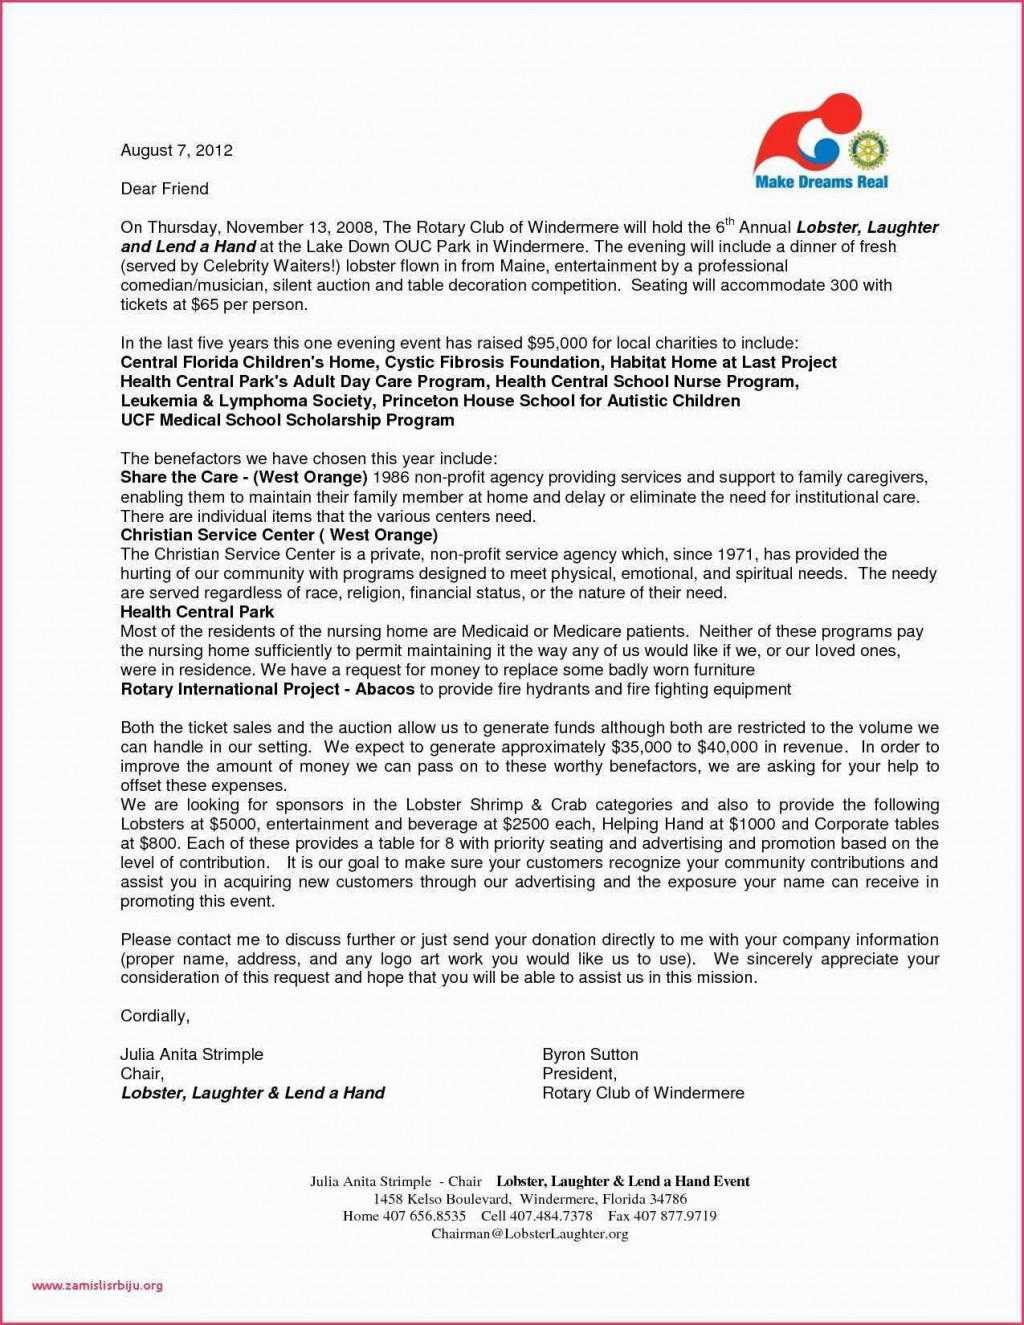 006 Wondrou Silent Auction Donation Certificate Template High Definition Large